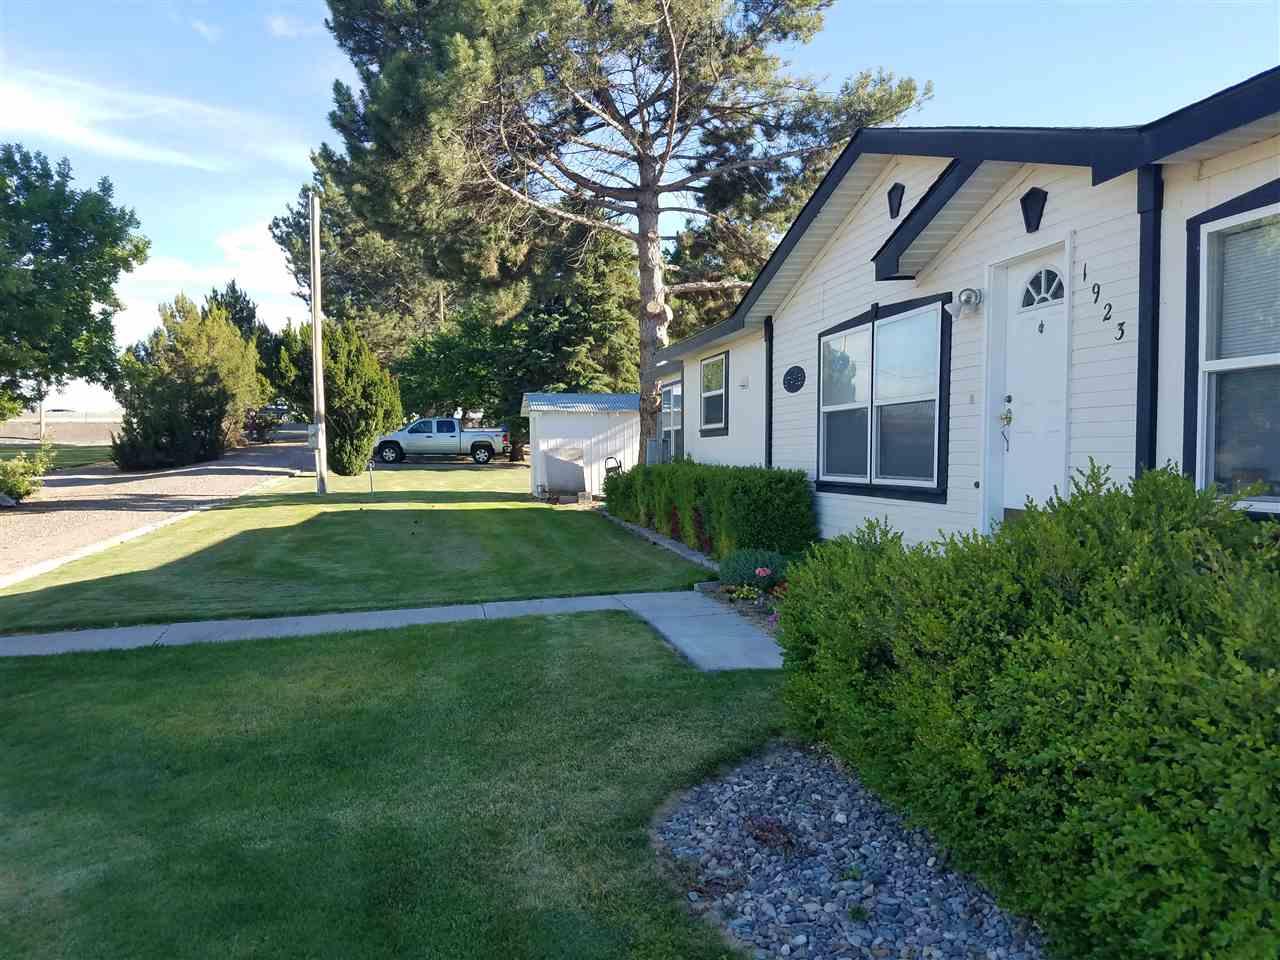 1923 Pole line Rd. E.,Twin Falls,Idaho 83301,Business/Commercial,1923 Pole line Rd. E.,98645893